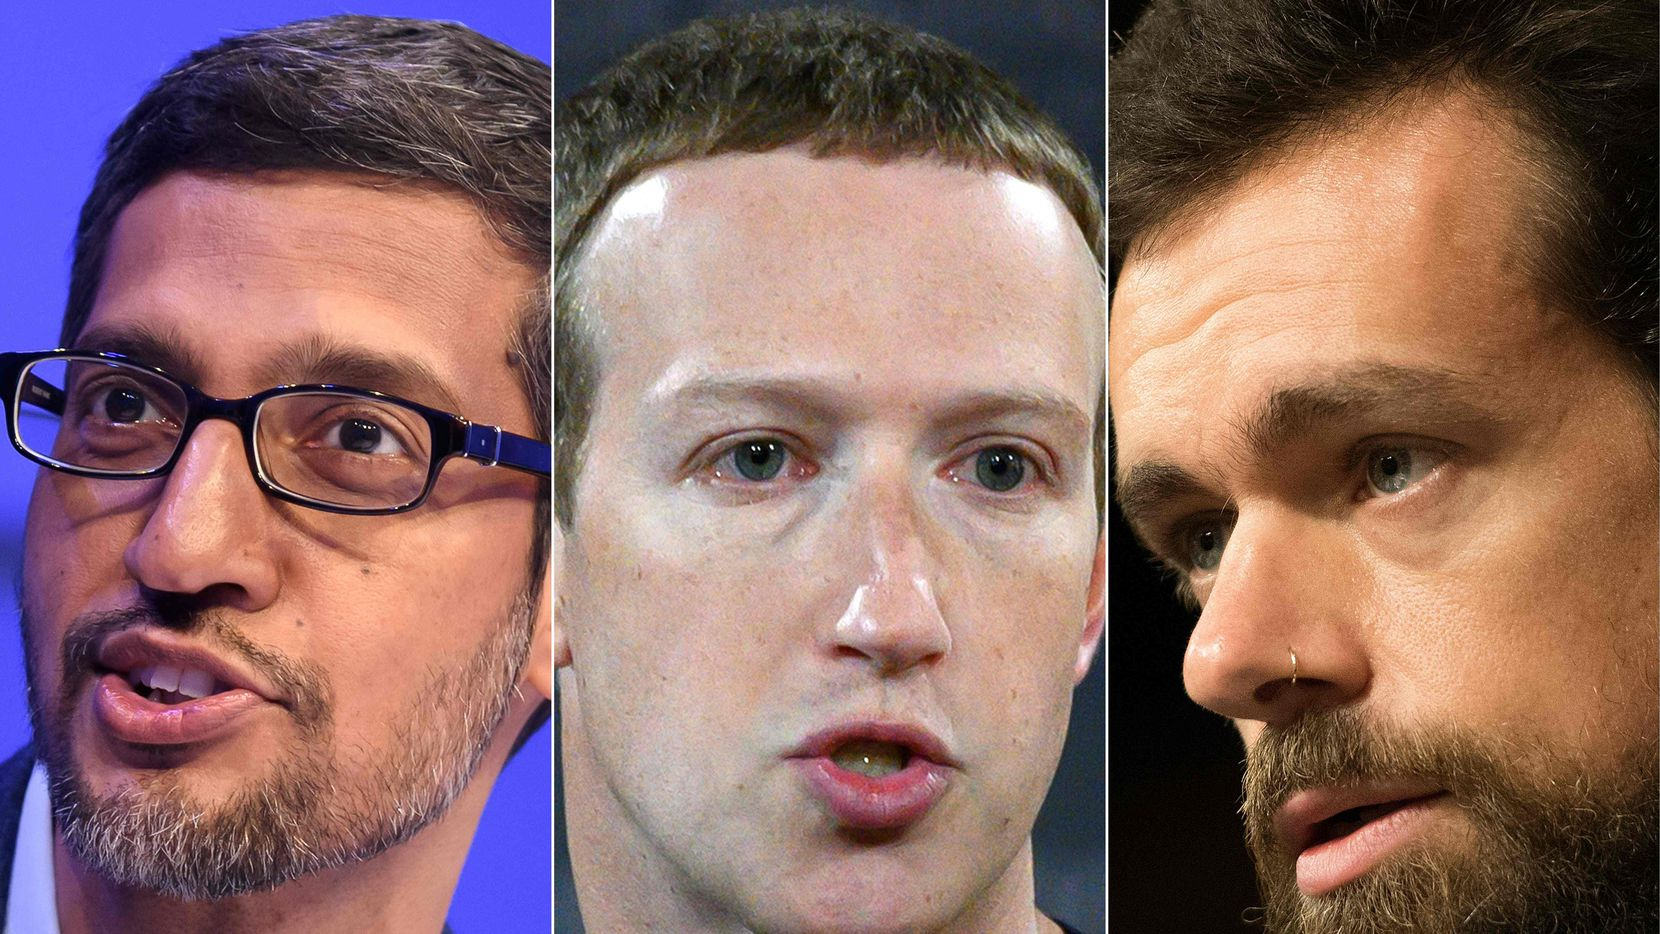 Alphabet CEO Sundar Pichai, Facebook founder Mark Zuckerberg, and Twitter CEO of Twitter Jack Dorsey.